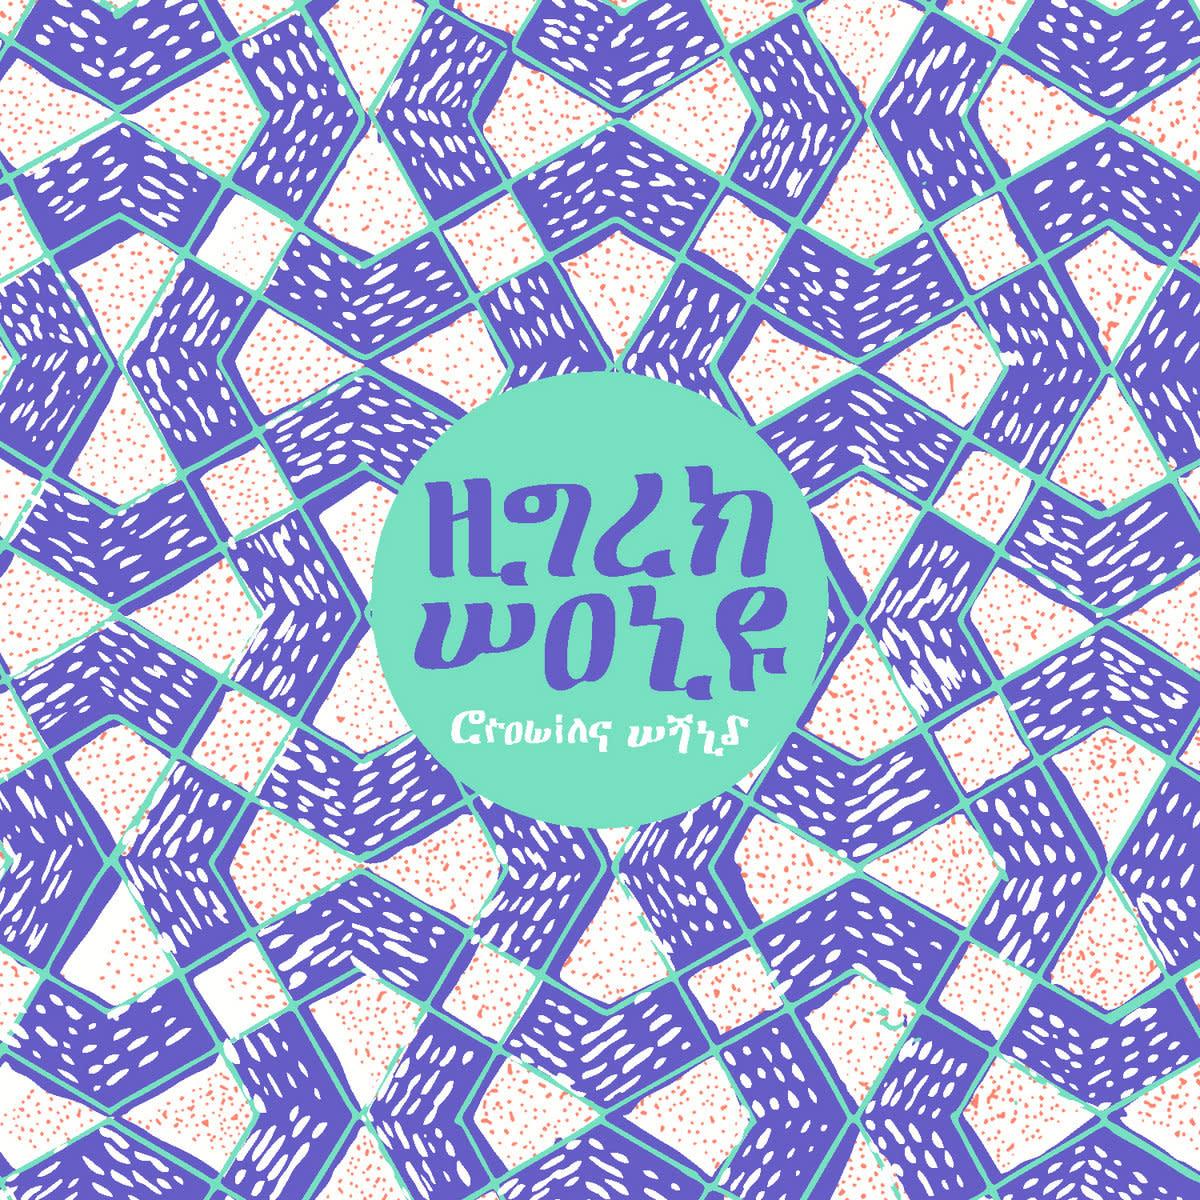 High Wolf • Growing Wild-1